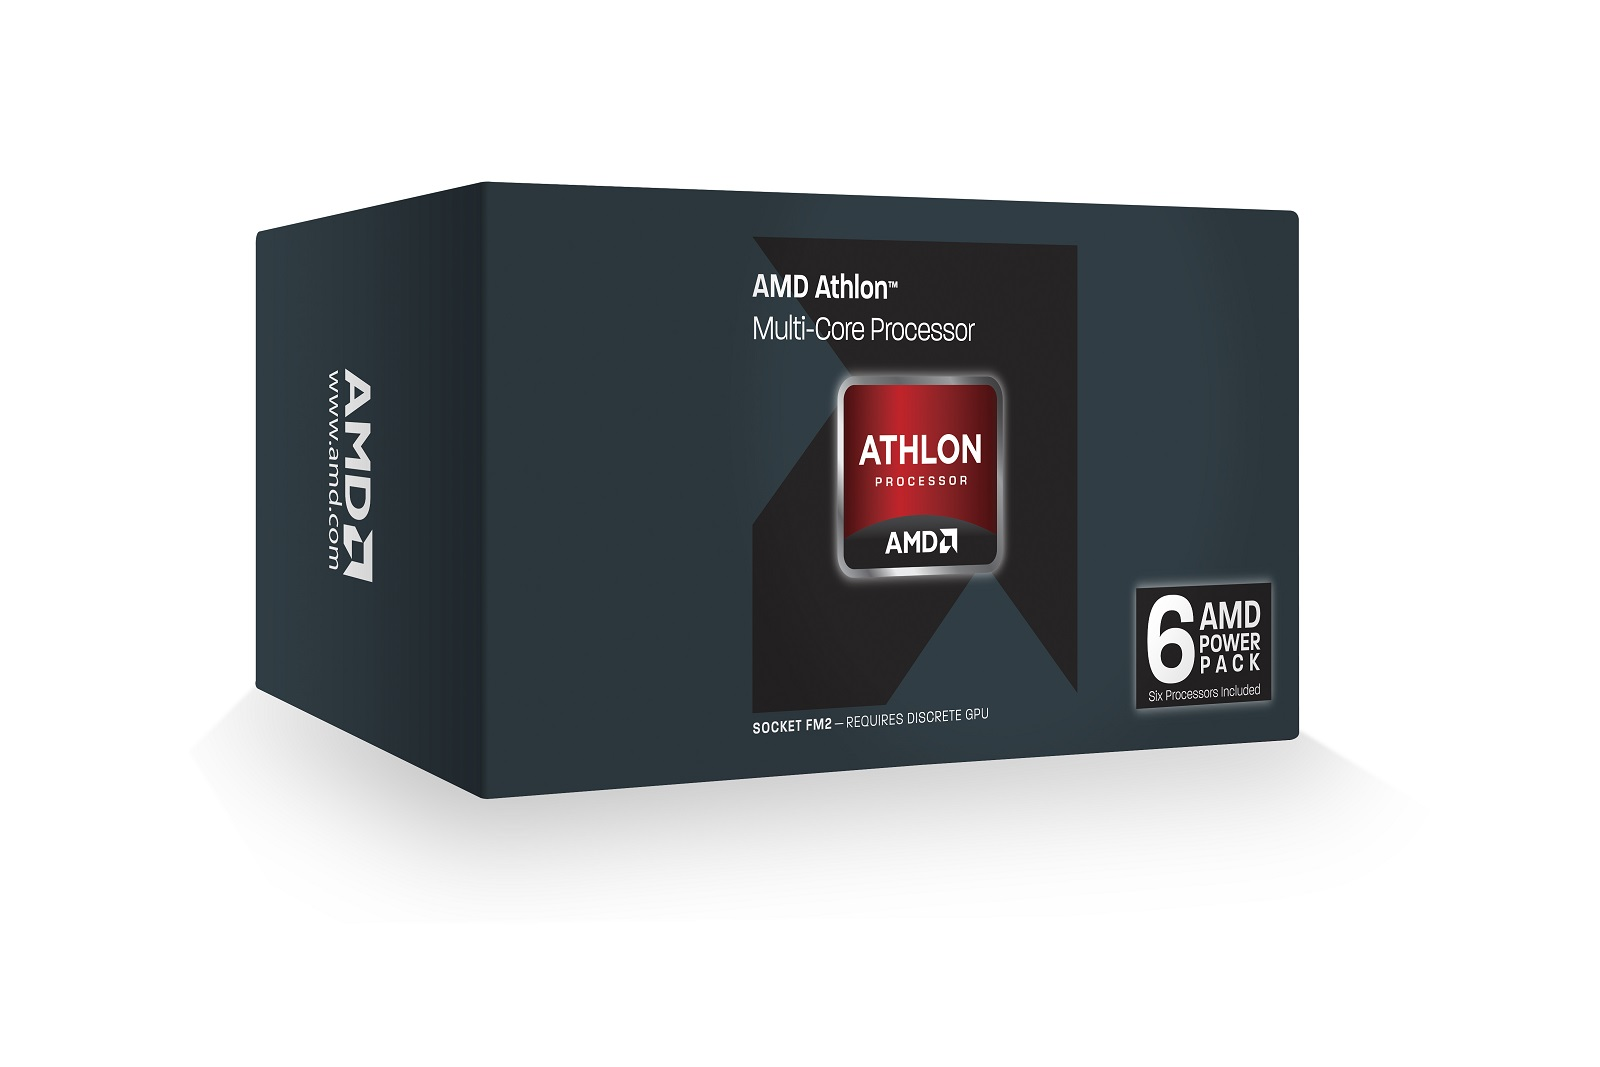 55064A_AMD_PowerPack_Athlon_PIB_right (2)